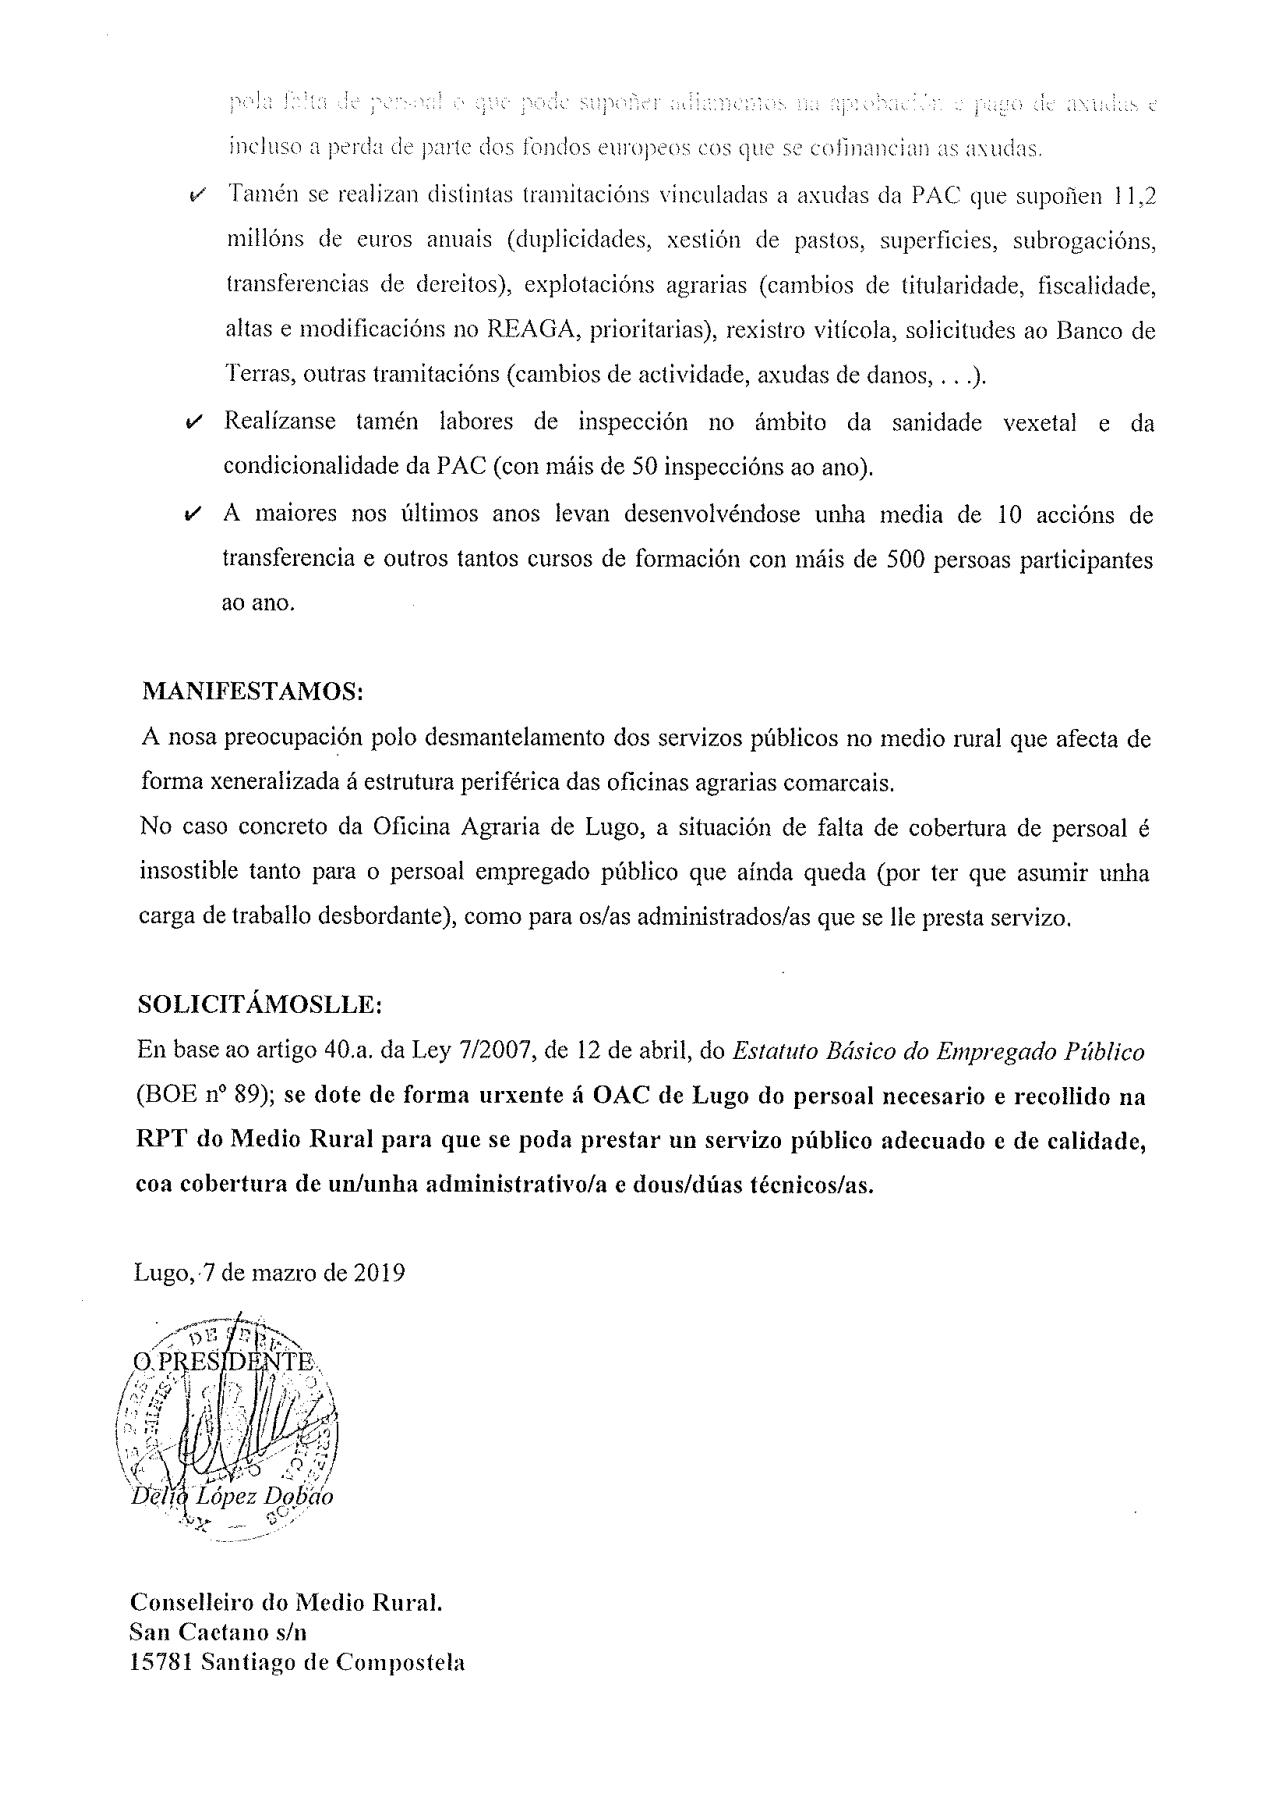 OAC LUGO 2